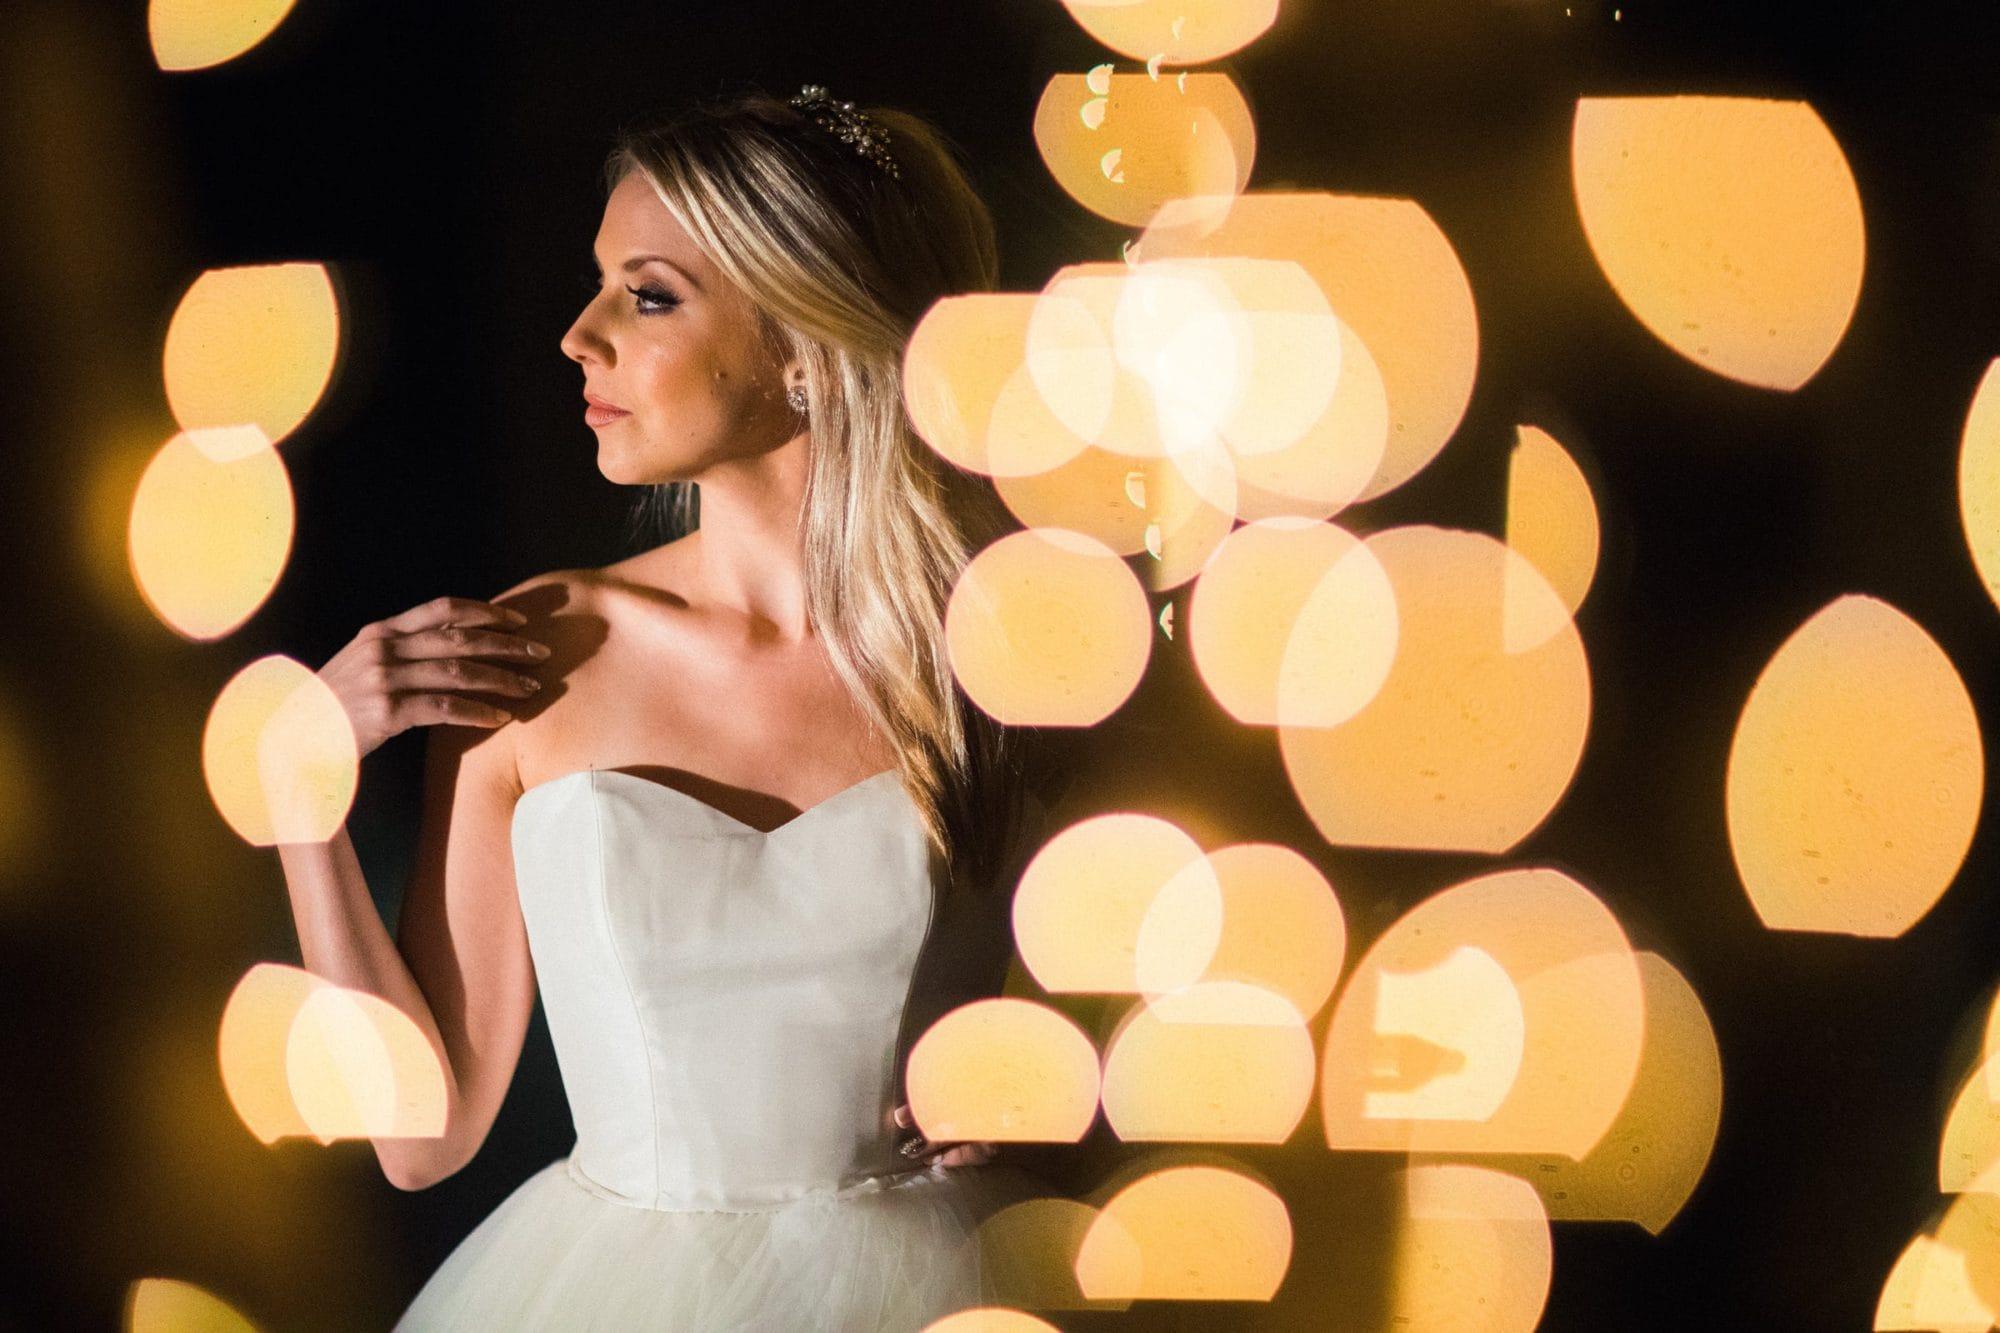 Umstead-Bridal-Portrait-Alexandra-Lights-1